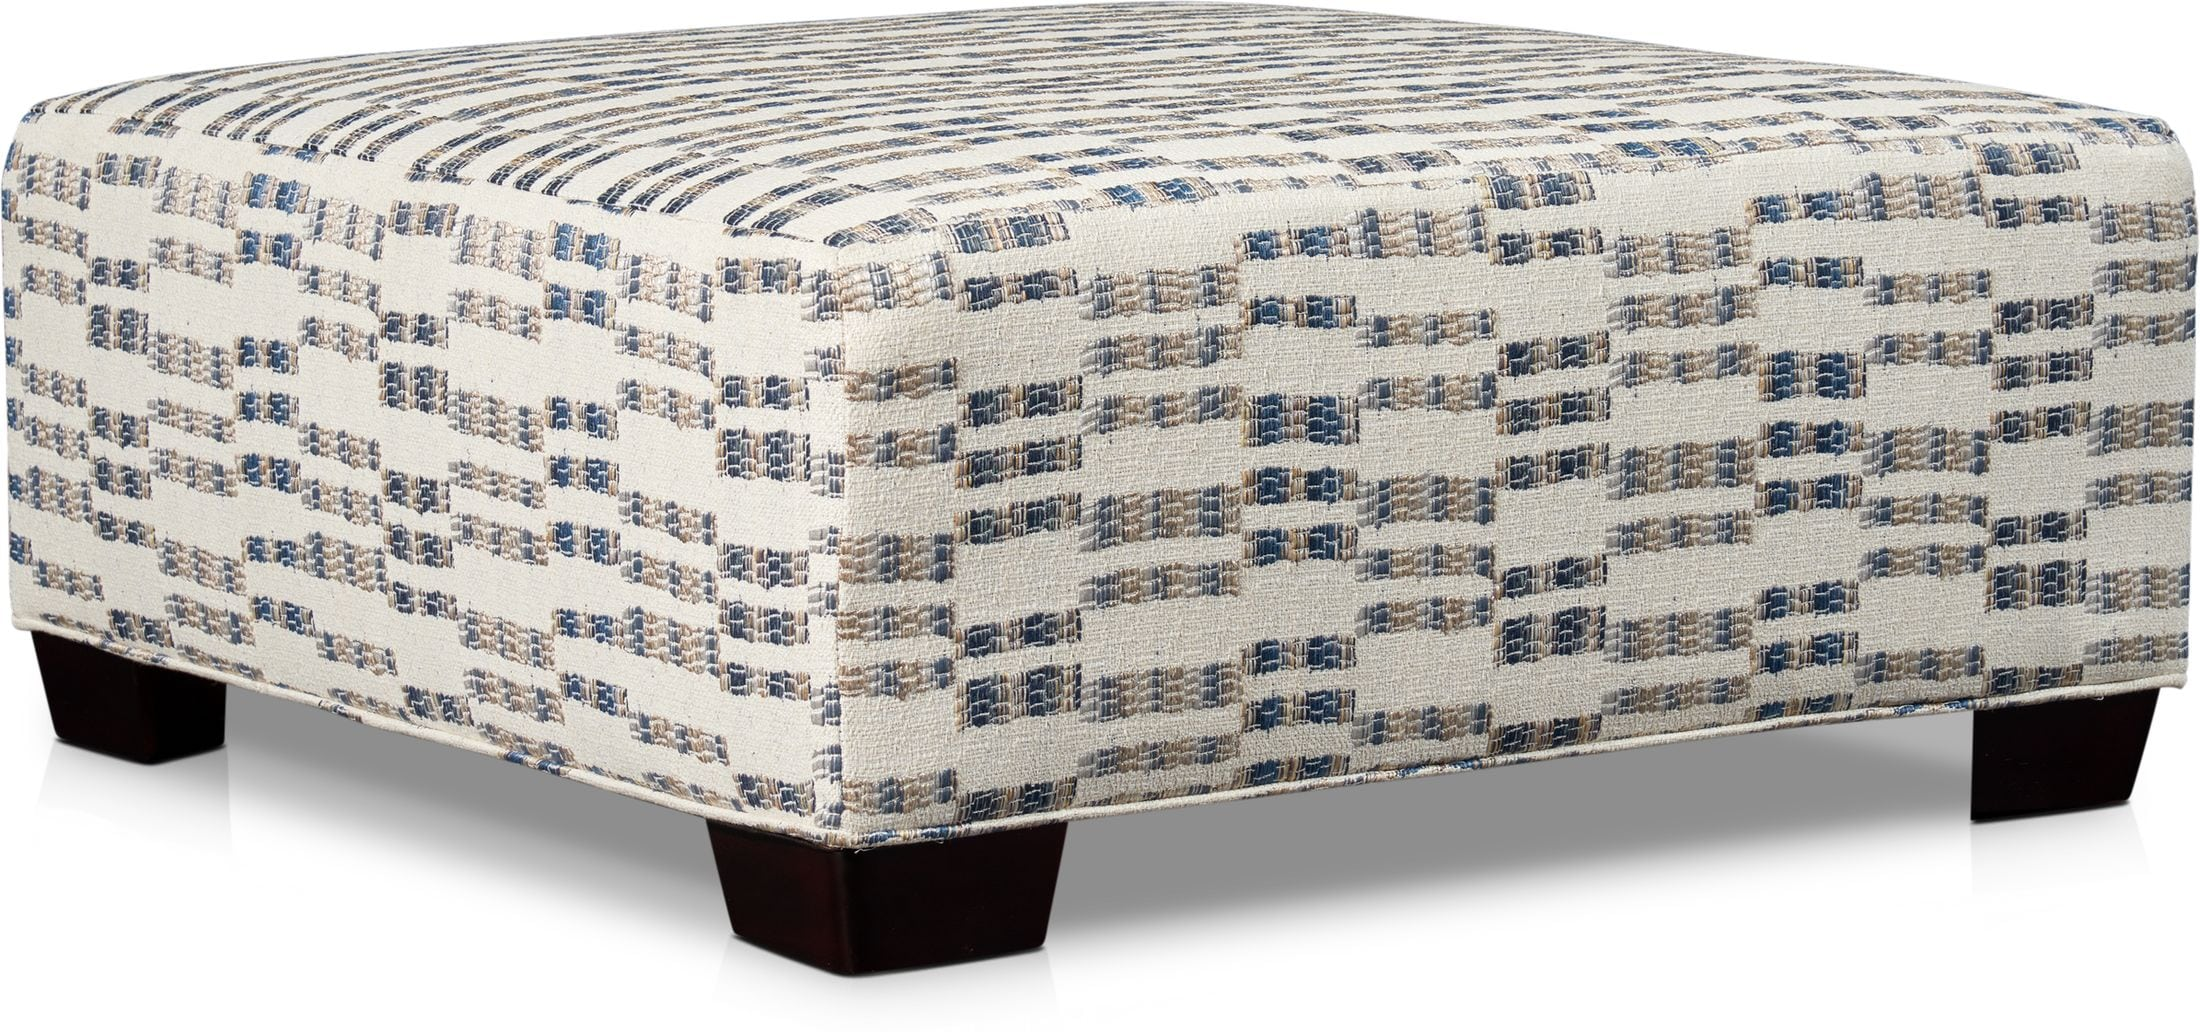 Living Room Furniture - Braden Ottoman